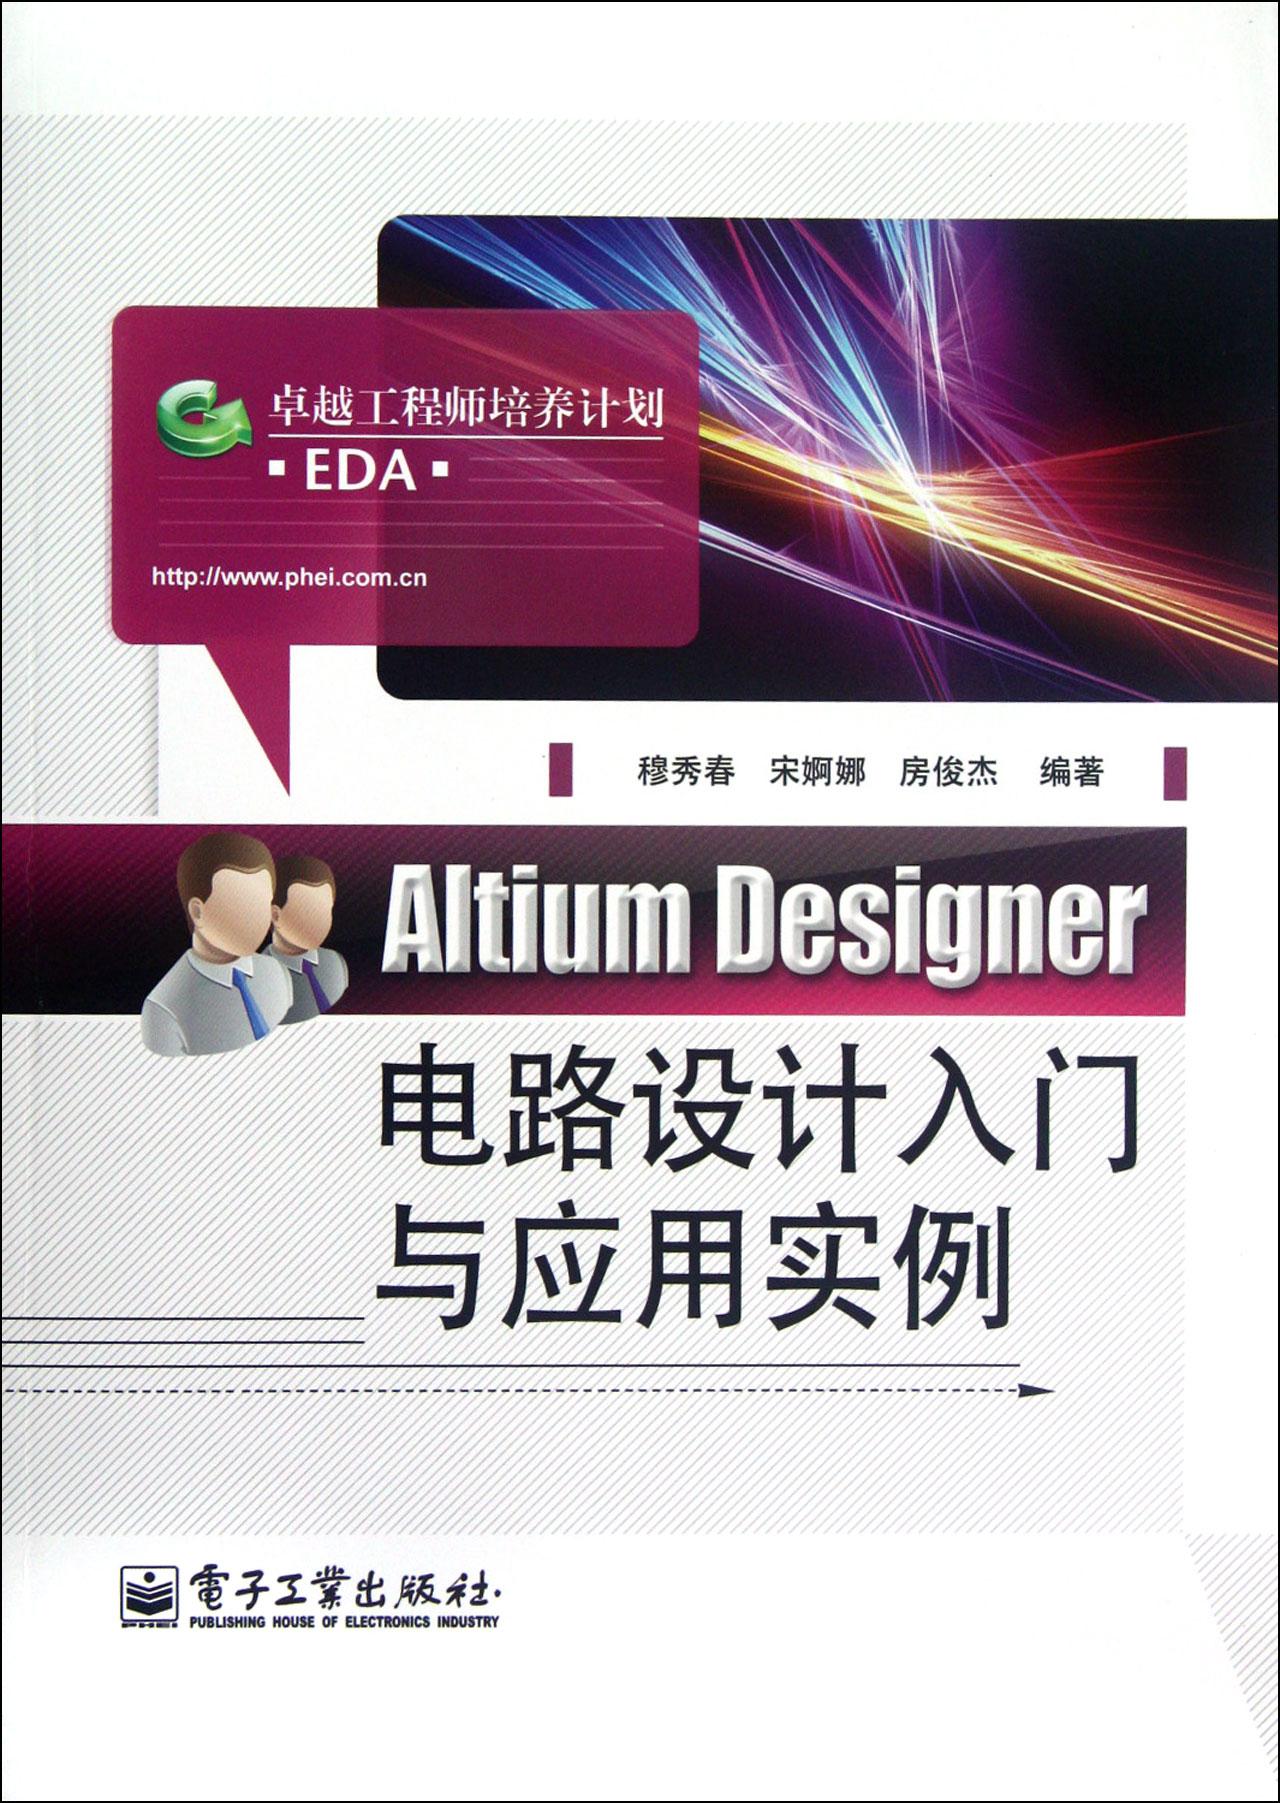 第一部分 基础篇 第1章 Altium Designer基础知识 1.1 Altium Designer的功能与特点 1.2 Altium Designer的安装和升级 1.3 Altium Designer的激活 1.4 思考与练习 第2章 Altium Designer设计环境 2.1 Altium Designer的环境设计 2.2 Altium Designer的资源设置 2.3 Altium Designer的工作面板和窗口管理 2.